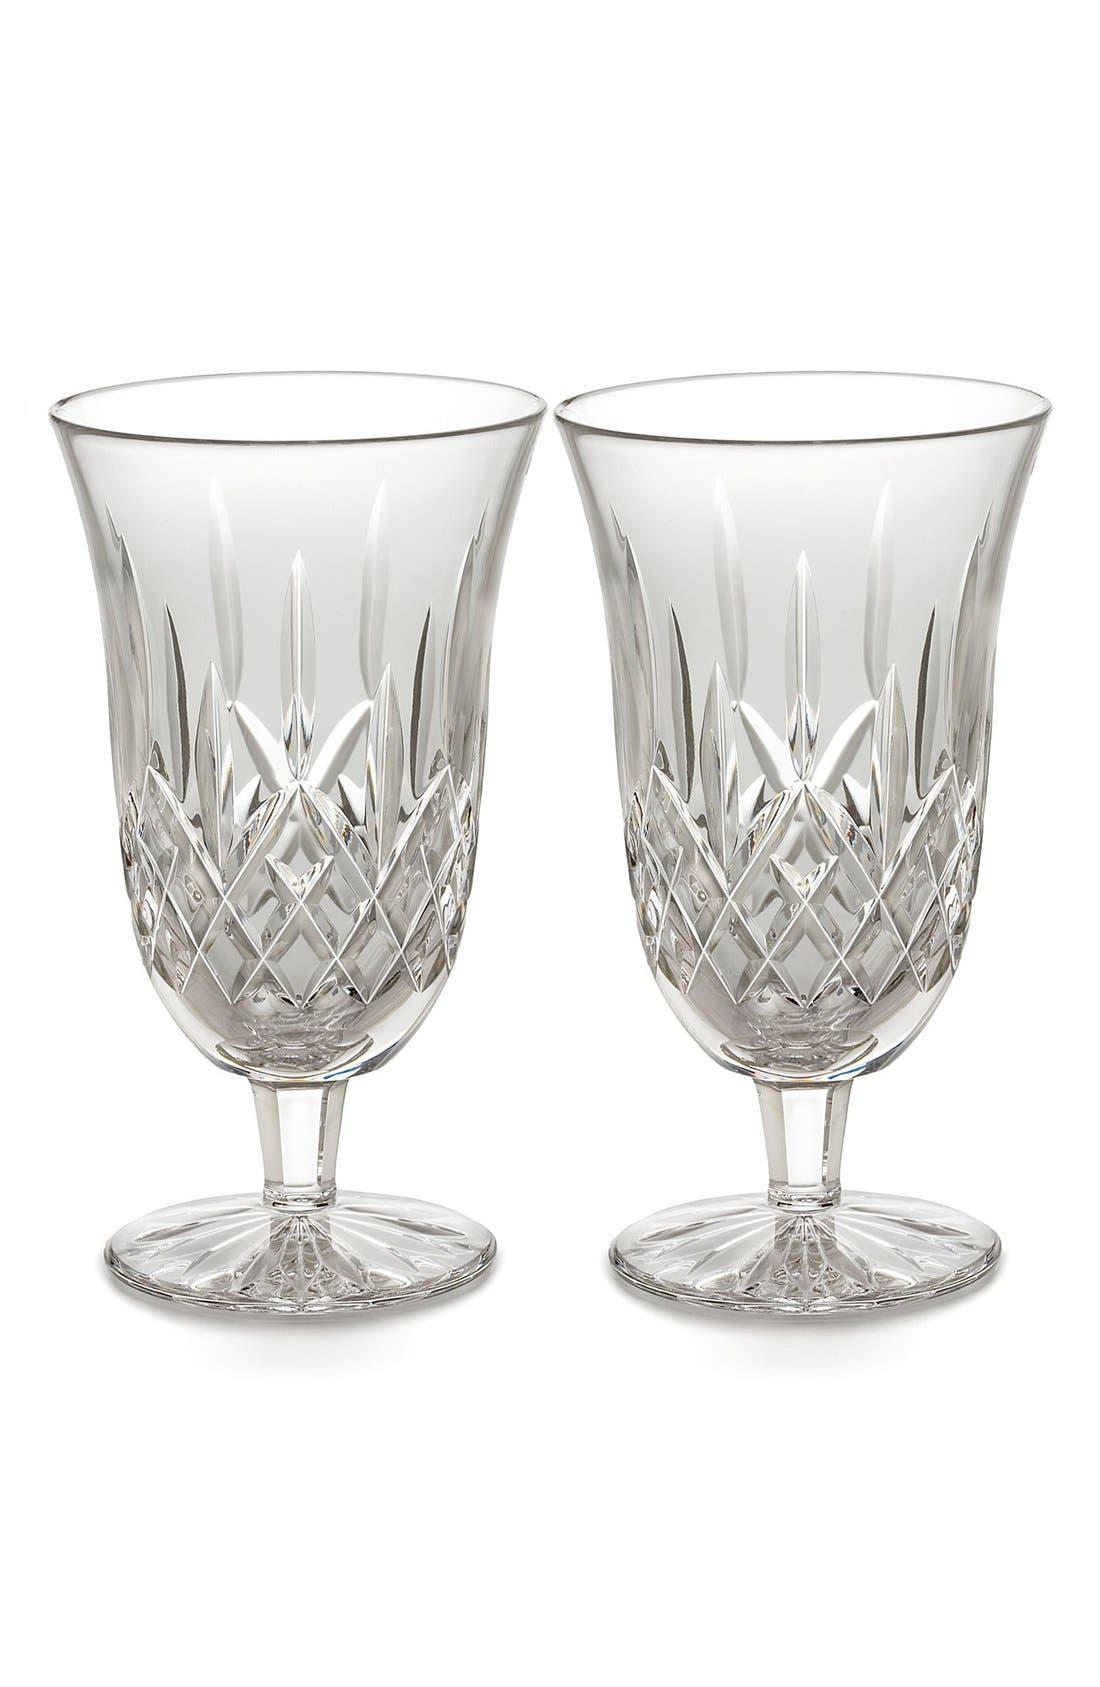 Waterford 'Lismore' Lead Crystal Iced Beverage Glasses (Set of 2)